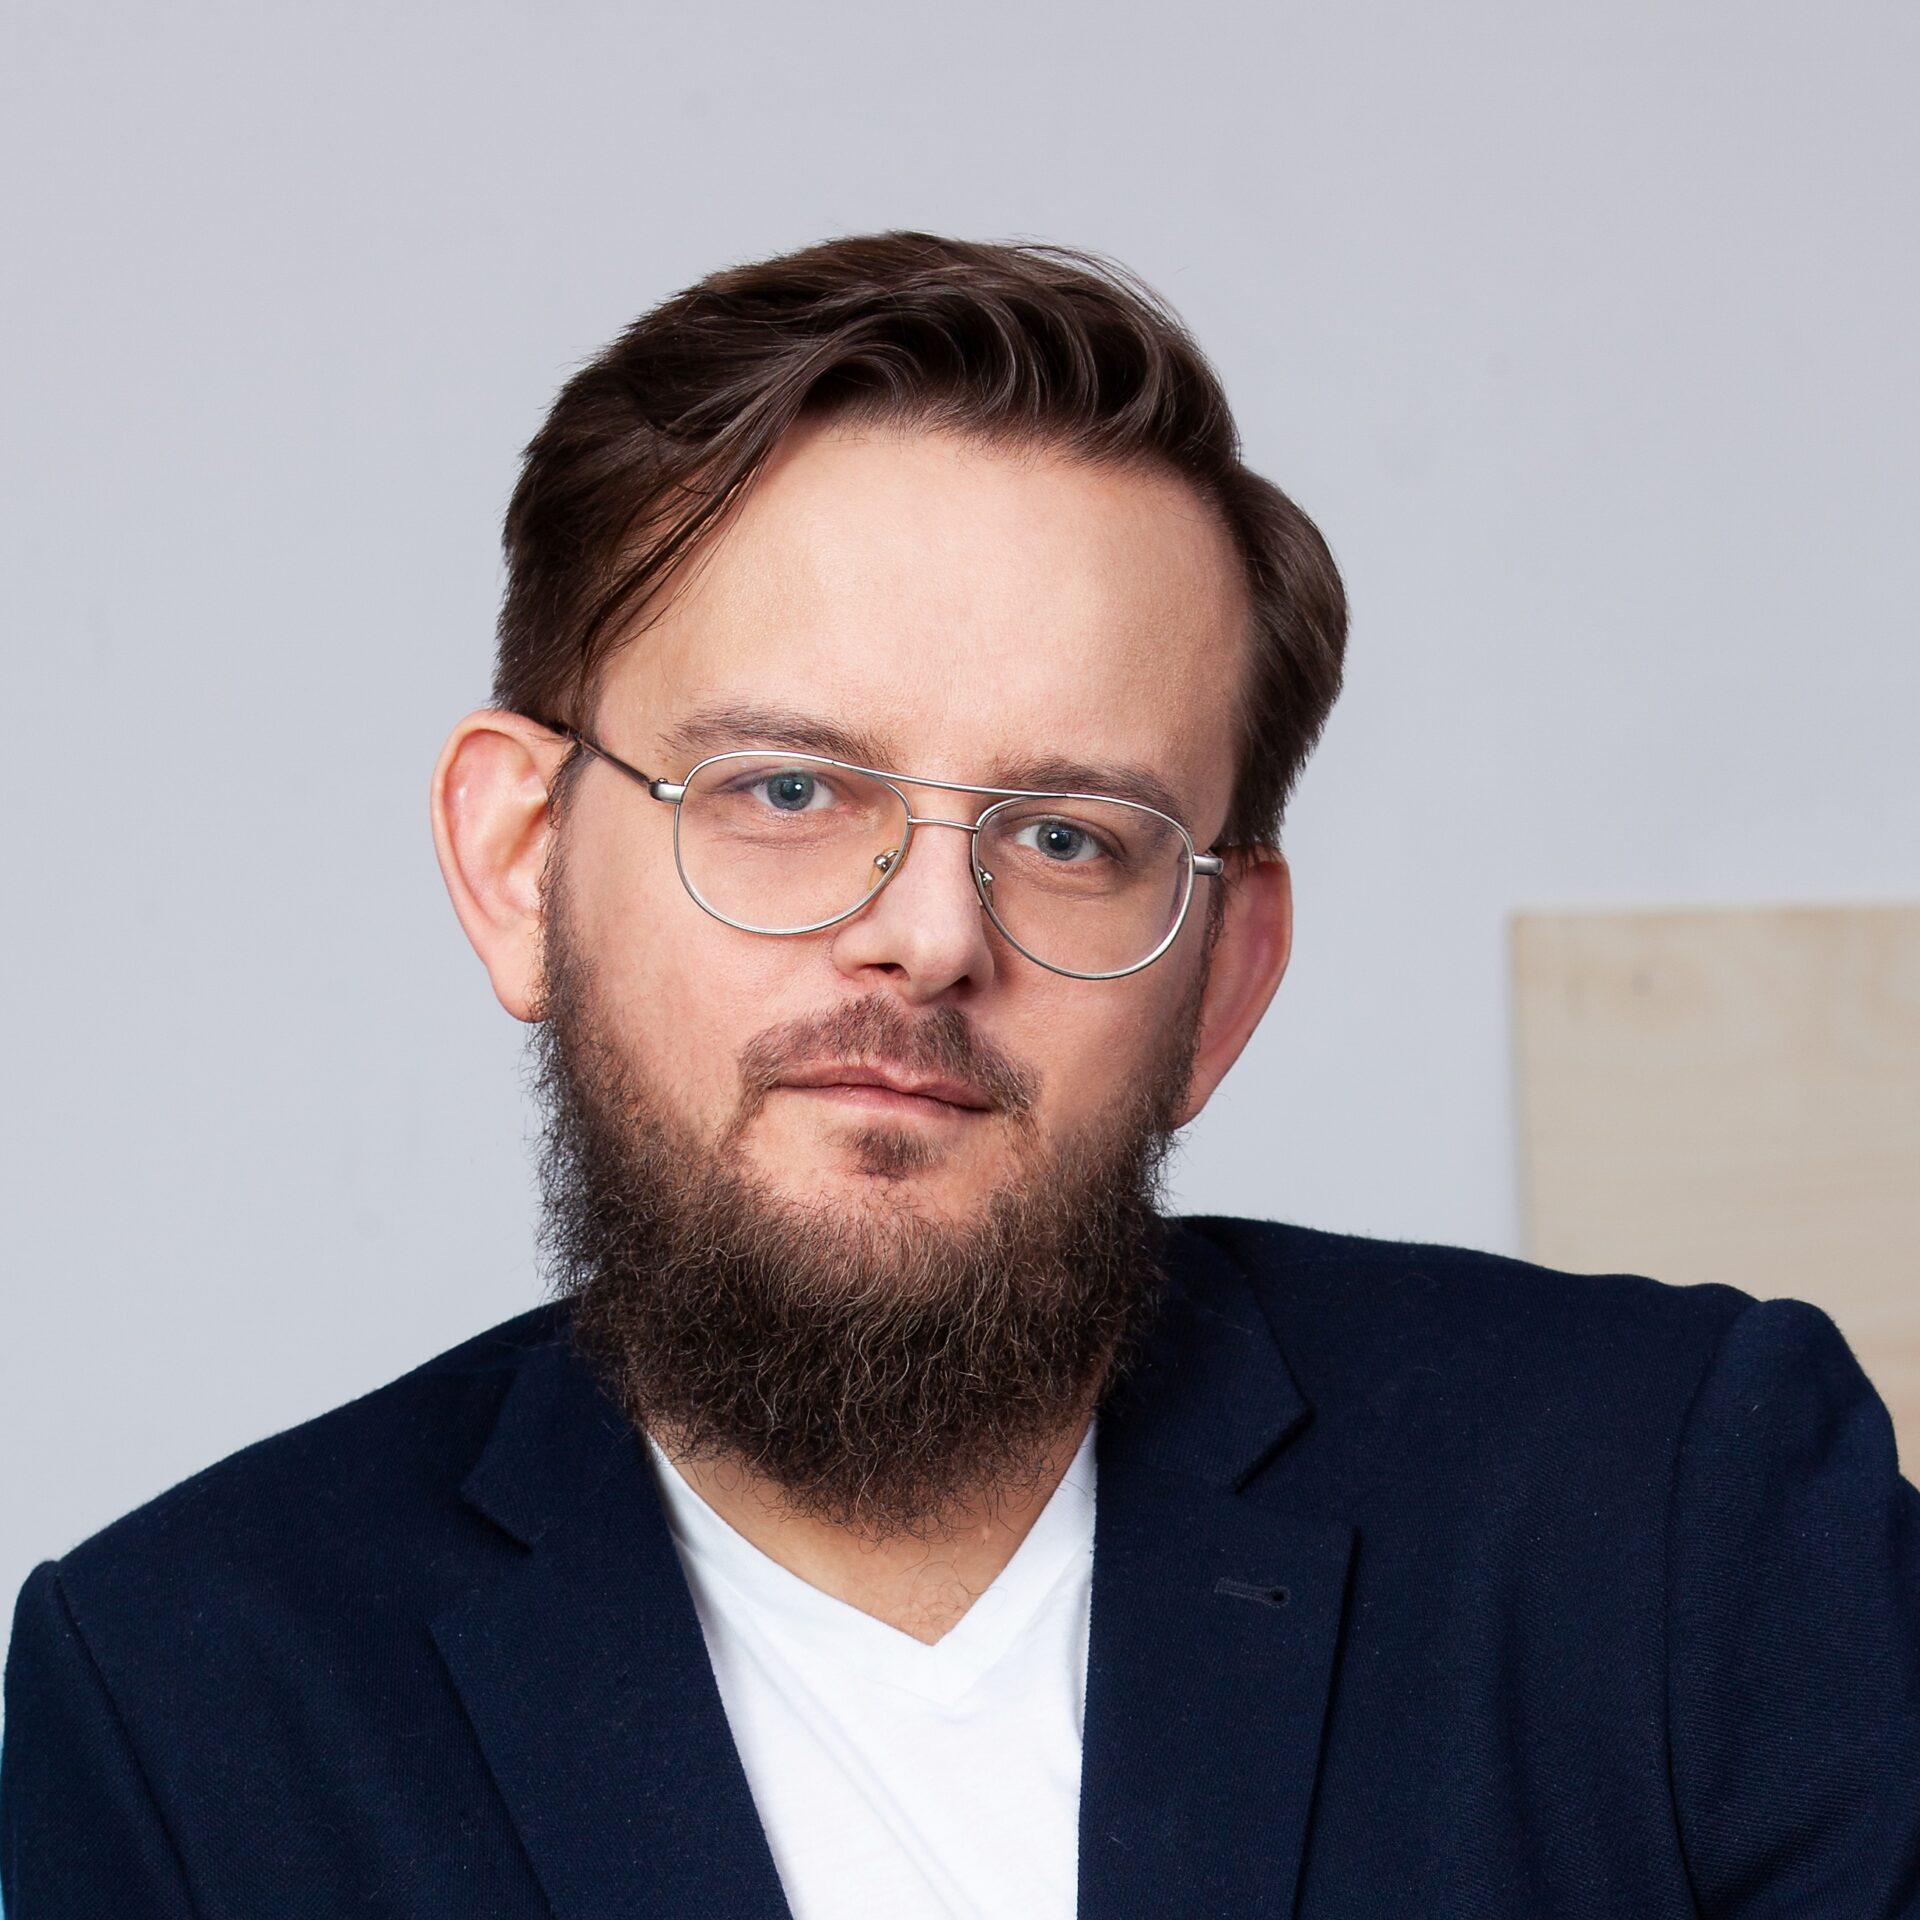 Artur Roguski